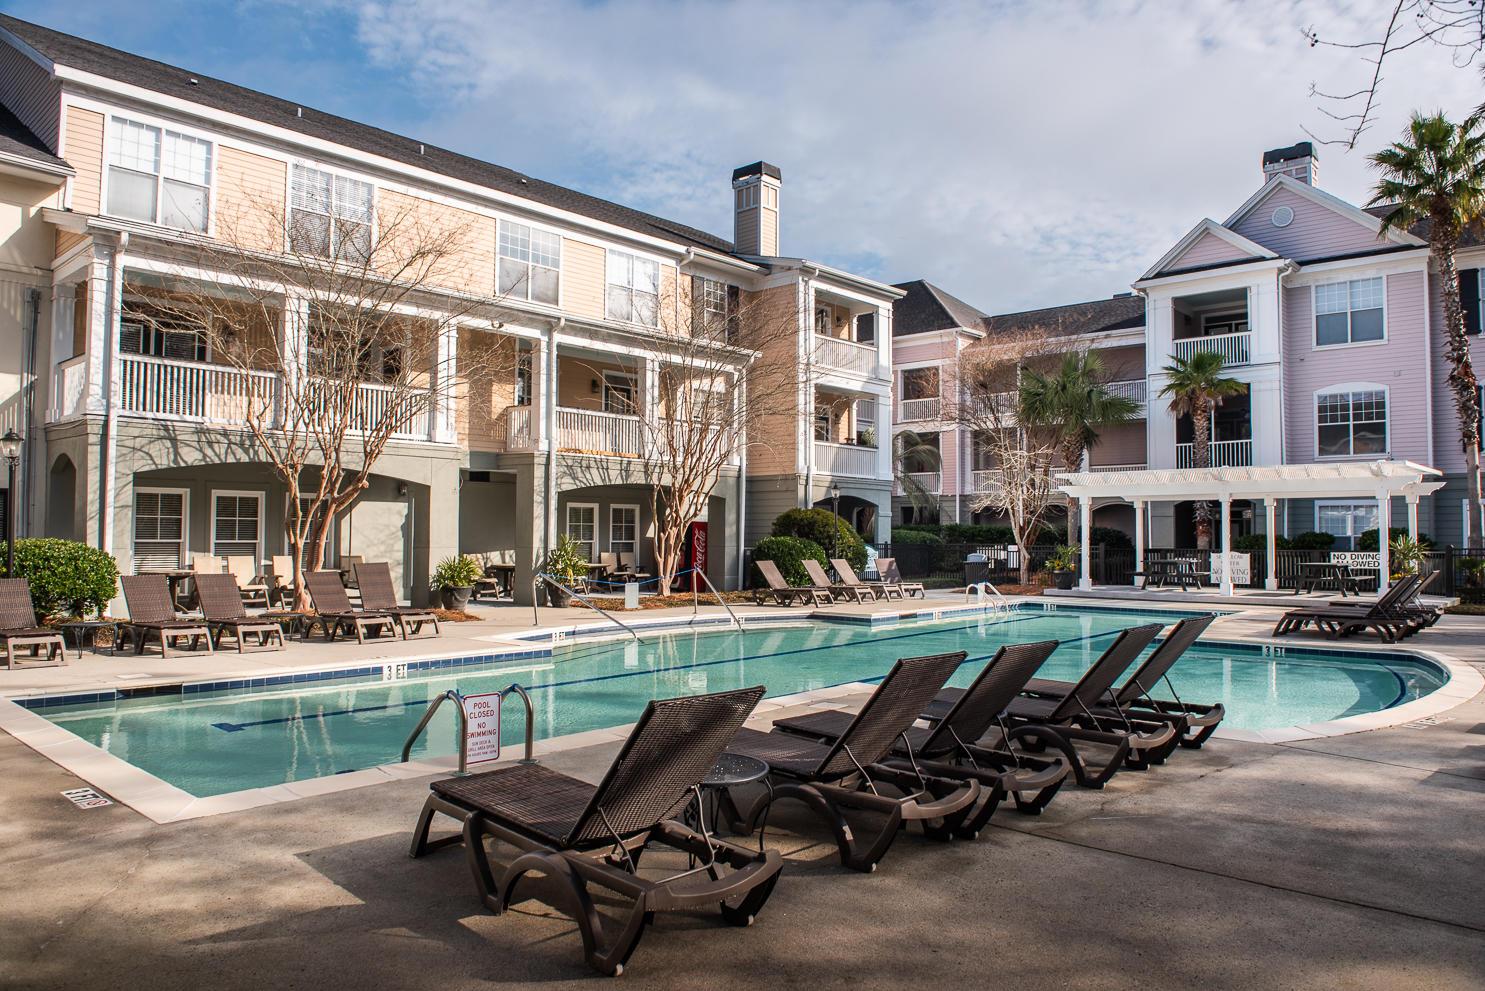 Daniel Landing Condos Homes For Sale - 130 River Landing, Charleston, SC - 2